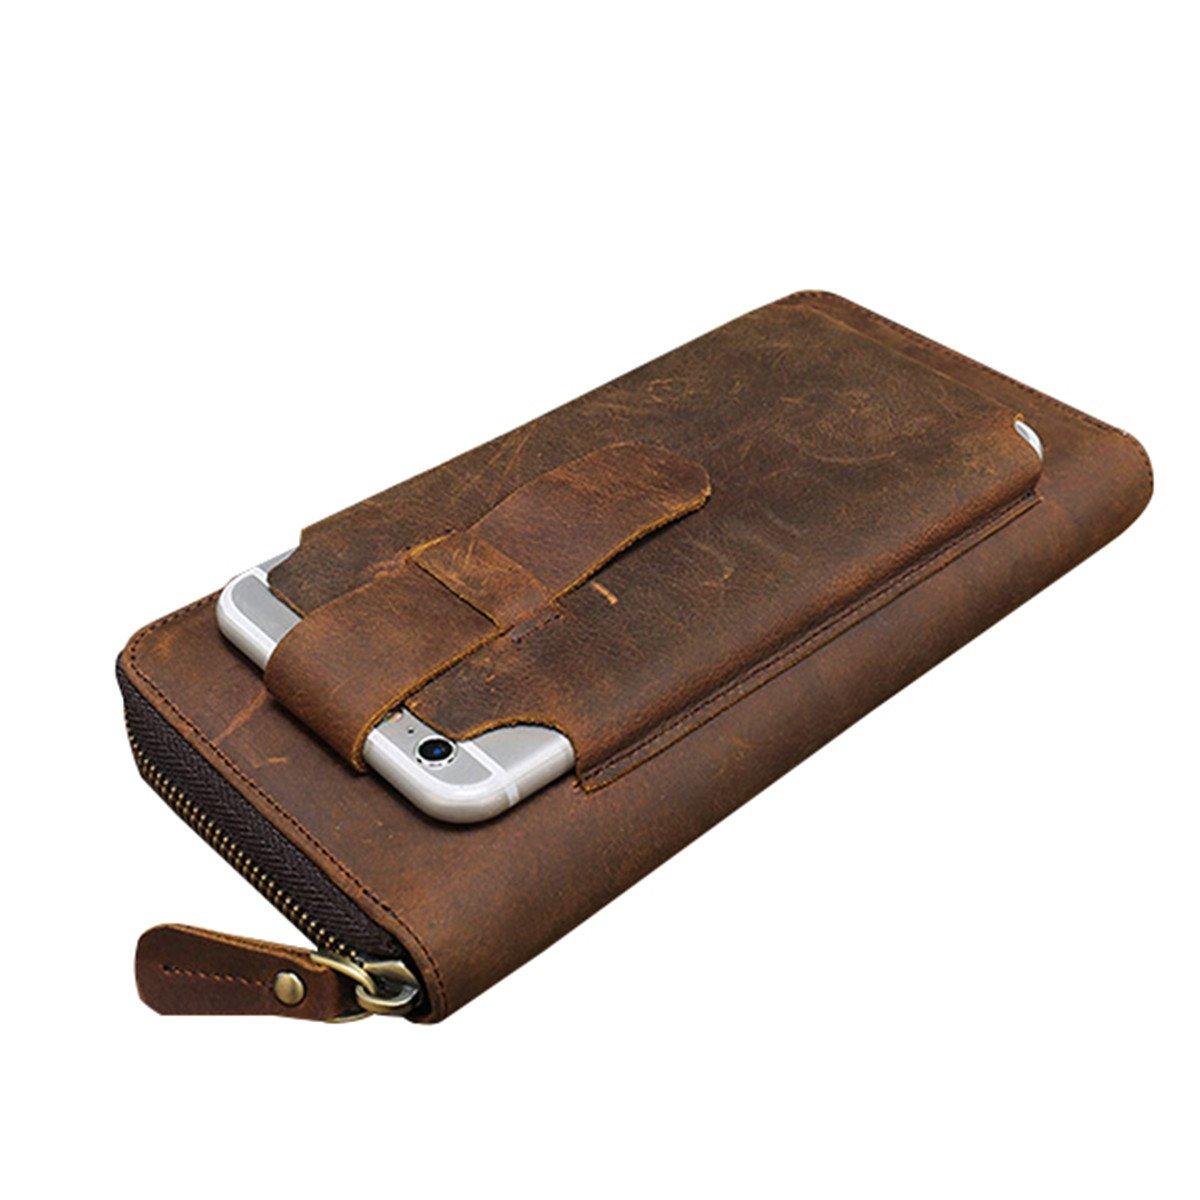 JOSEKO Phone Wallet Case, Genuine Leather Vintage Coin Bag Business Zipper Long 5.5 Inche Phone Wallet for Men Coffee 7.68'' x 0.98'' x 3.94'' (L x W x H)